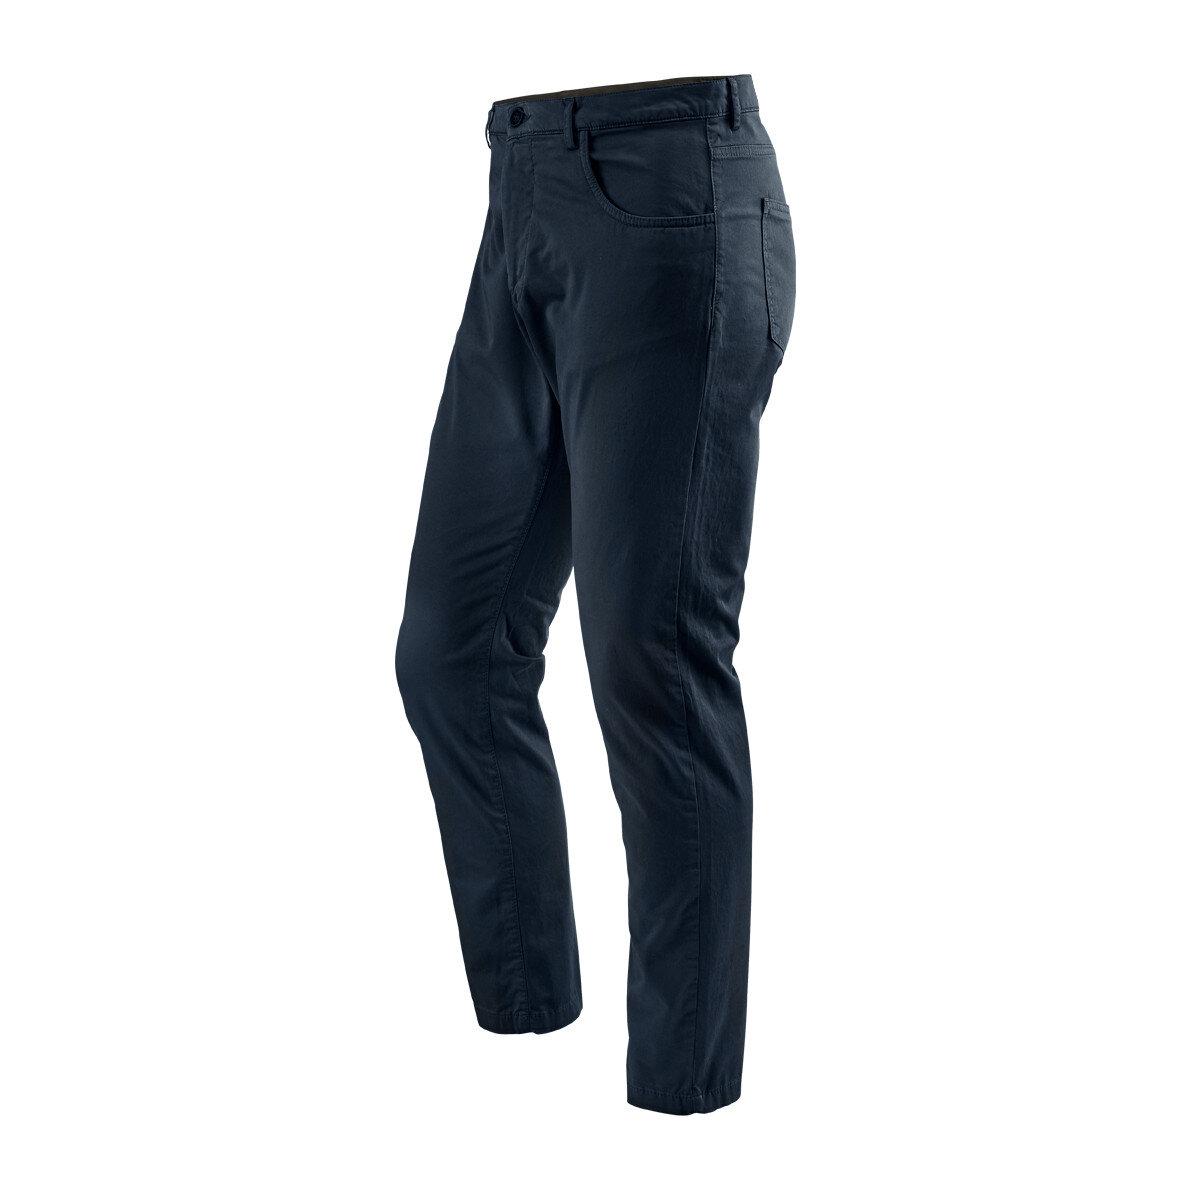 FIVEPOCKETS Pantaloni Uomo